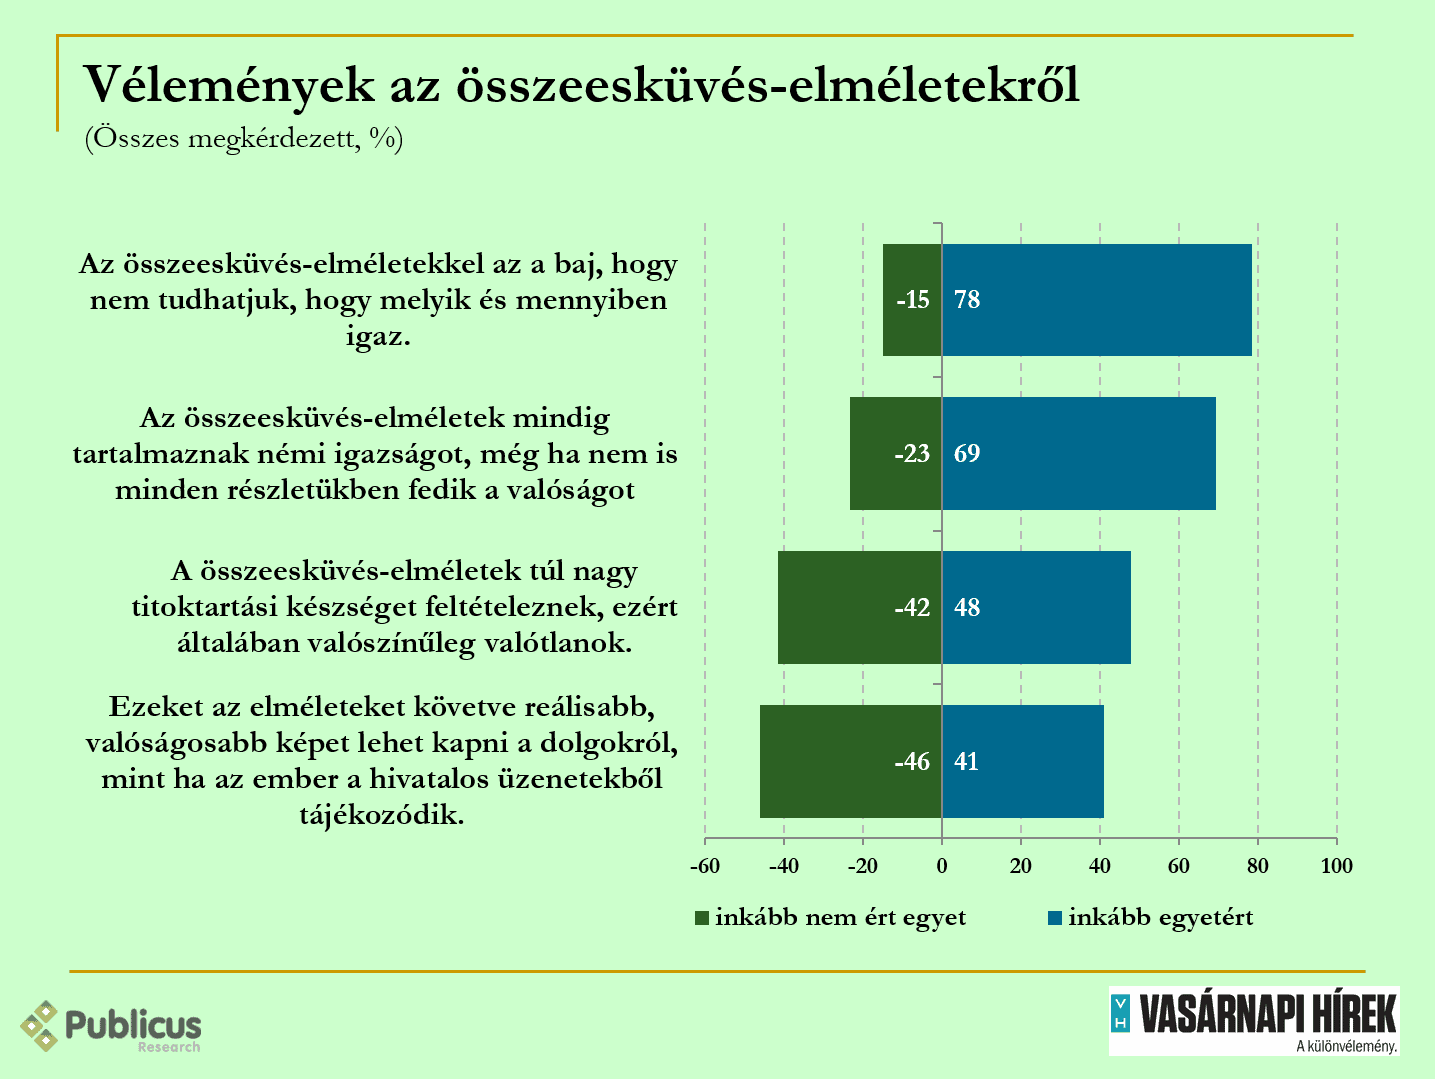 osszeesk_4